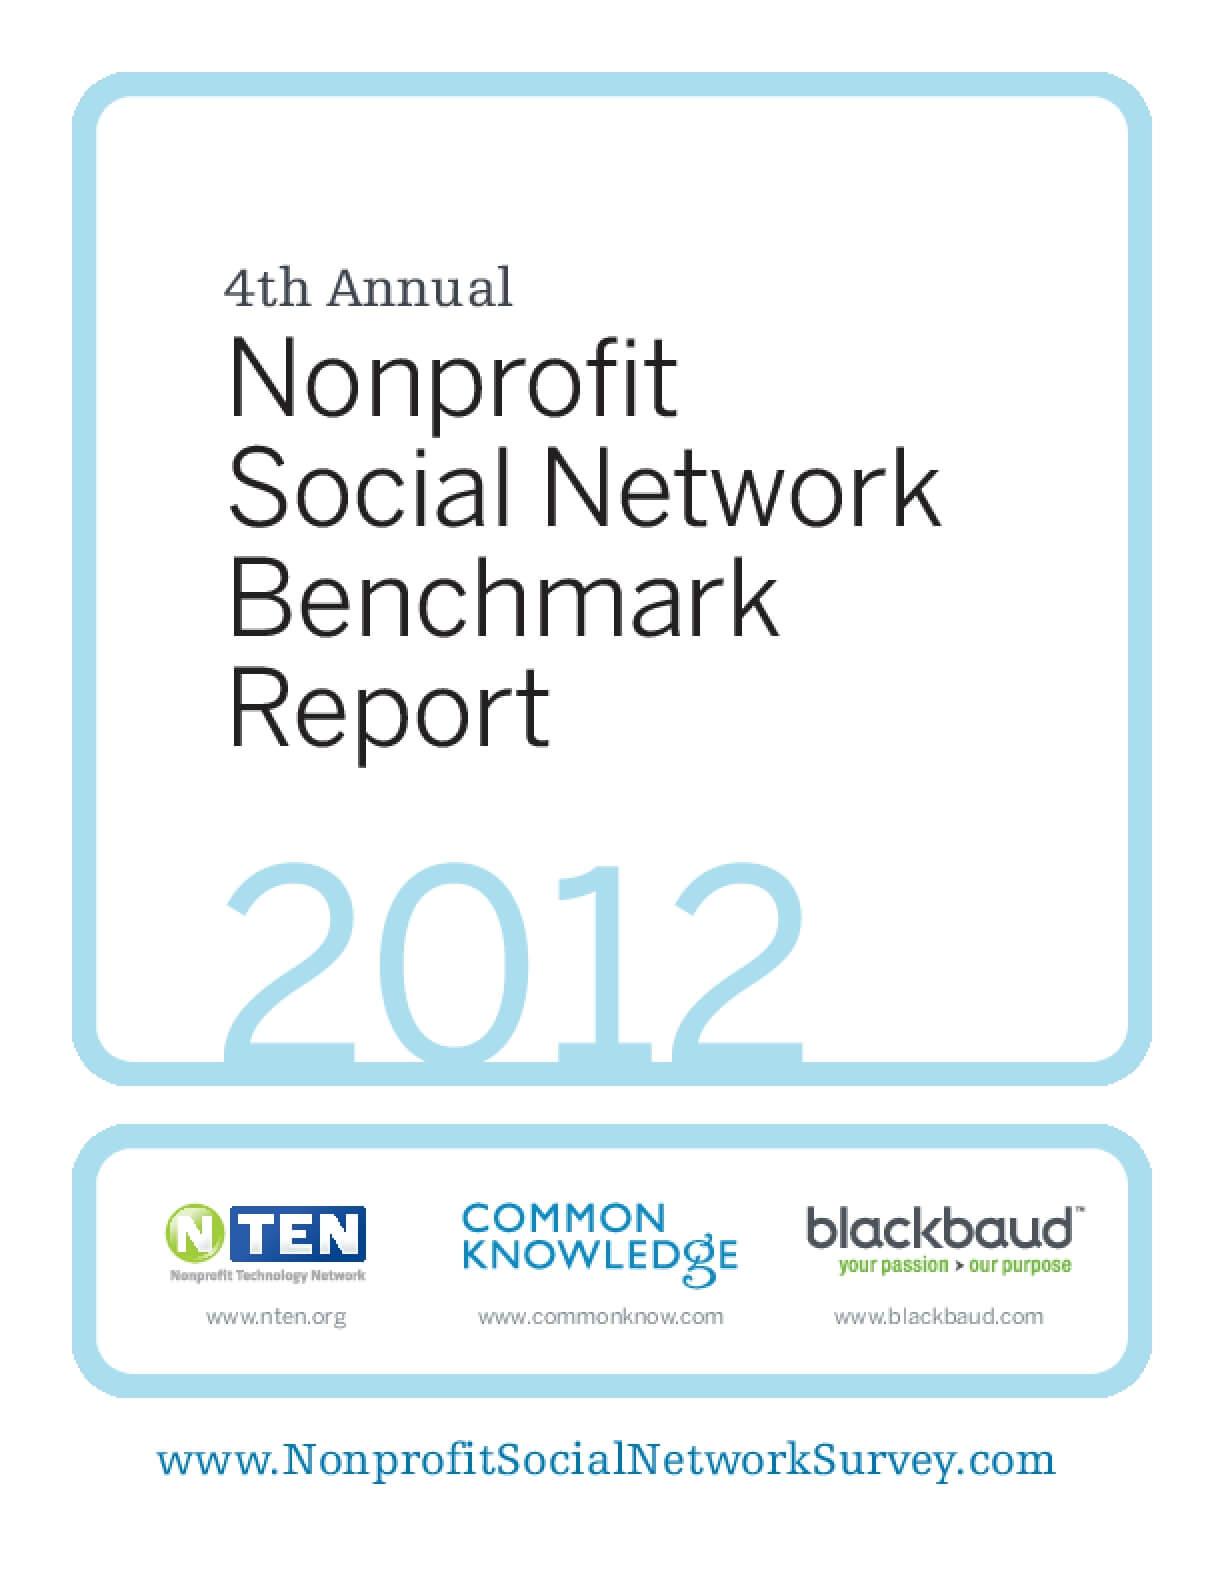 Nonprofit Social Network Benchmark Report, 2012